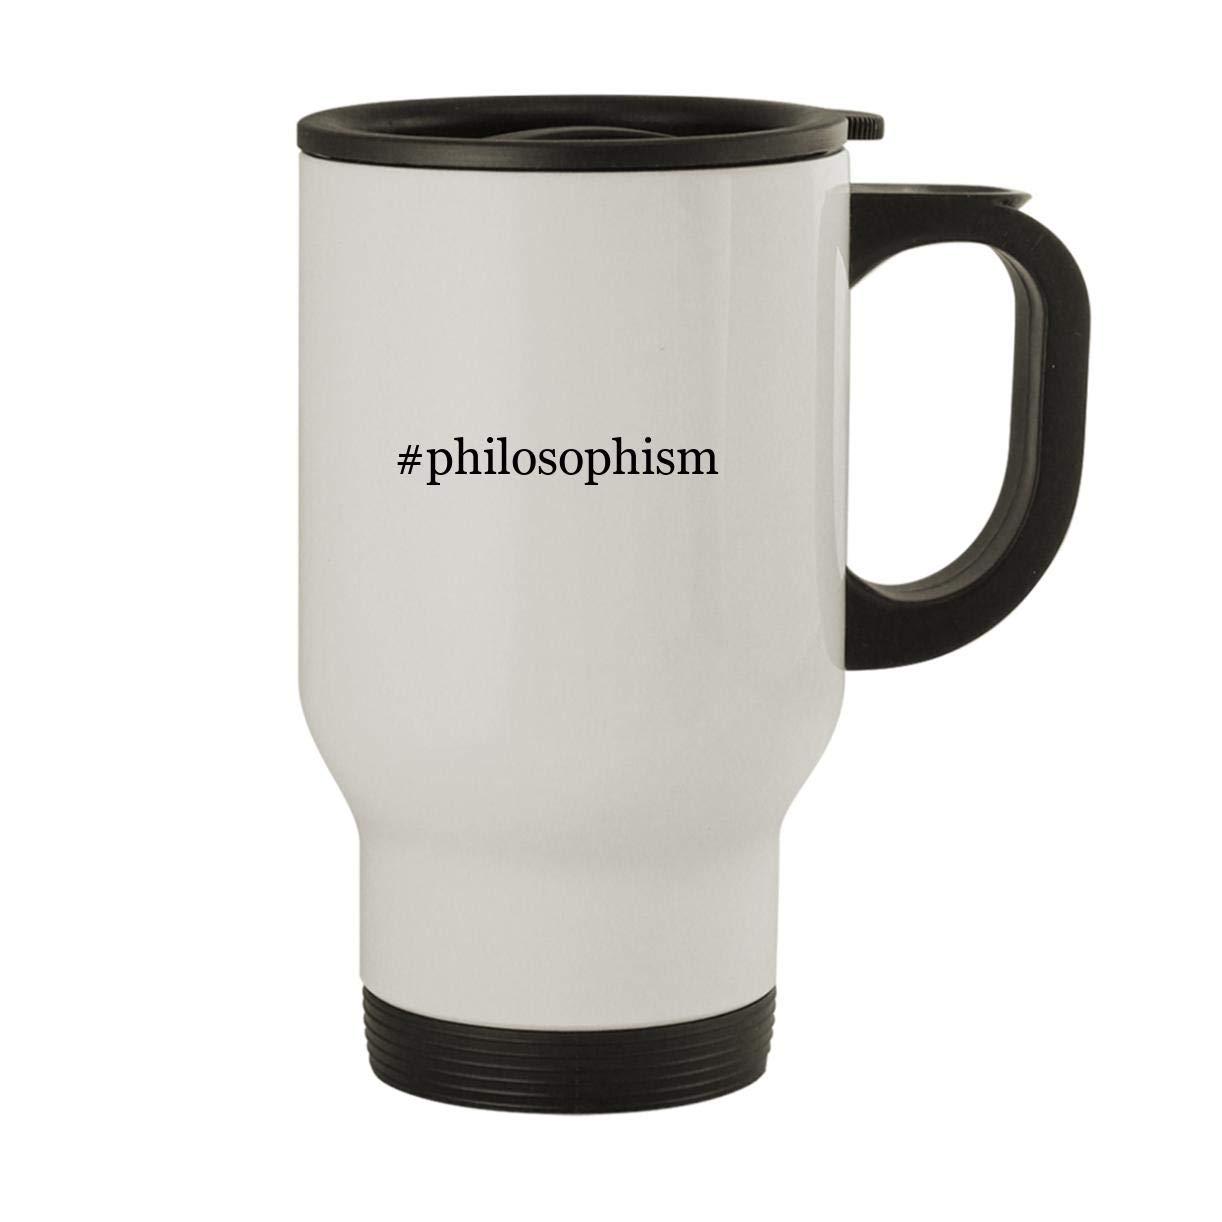 #philosophism - Stainless Steel Hashtag 14oz Travel Mug, White